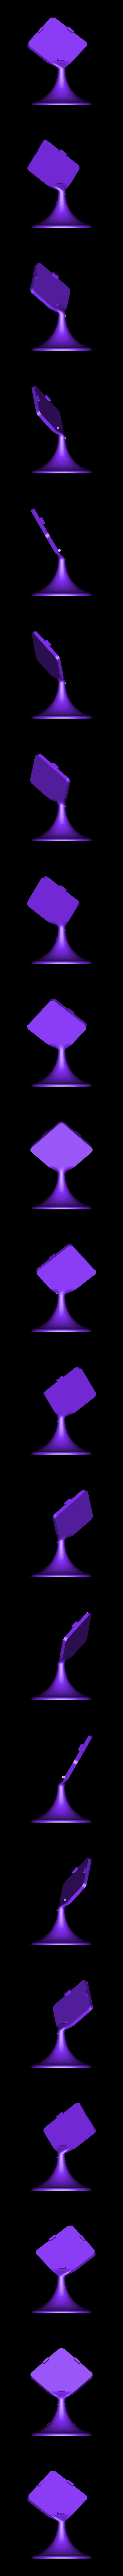 Table Clock_base.STL Download free STL file Sunburst Tabletop Clock • 3D printable template, Dadddy